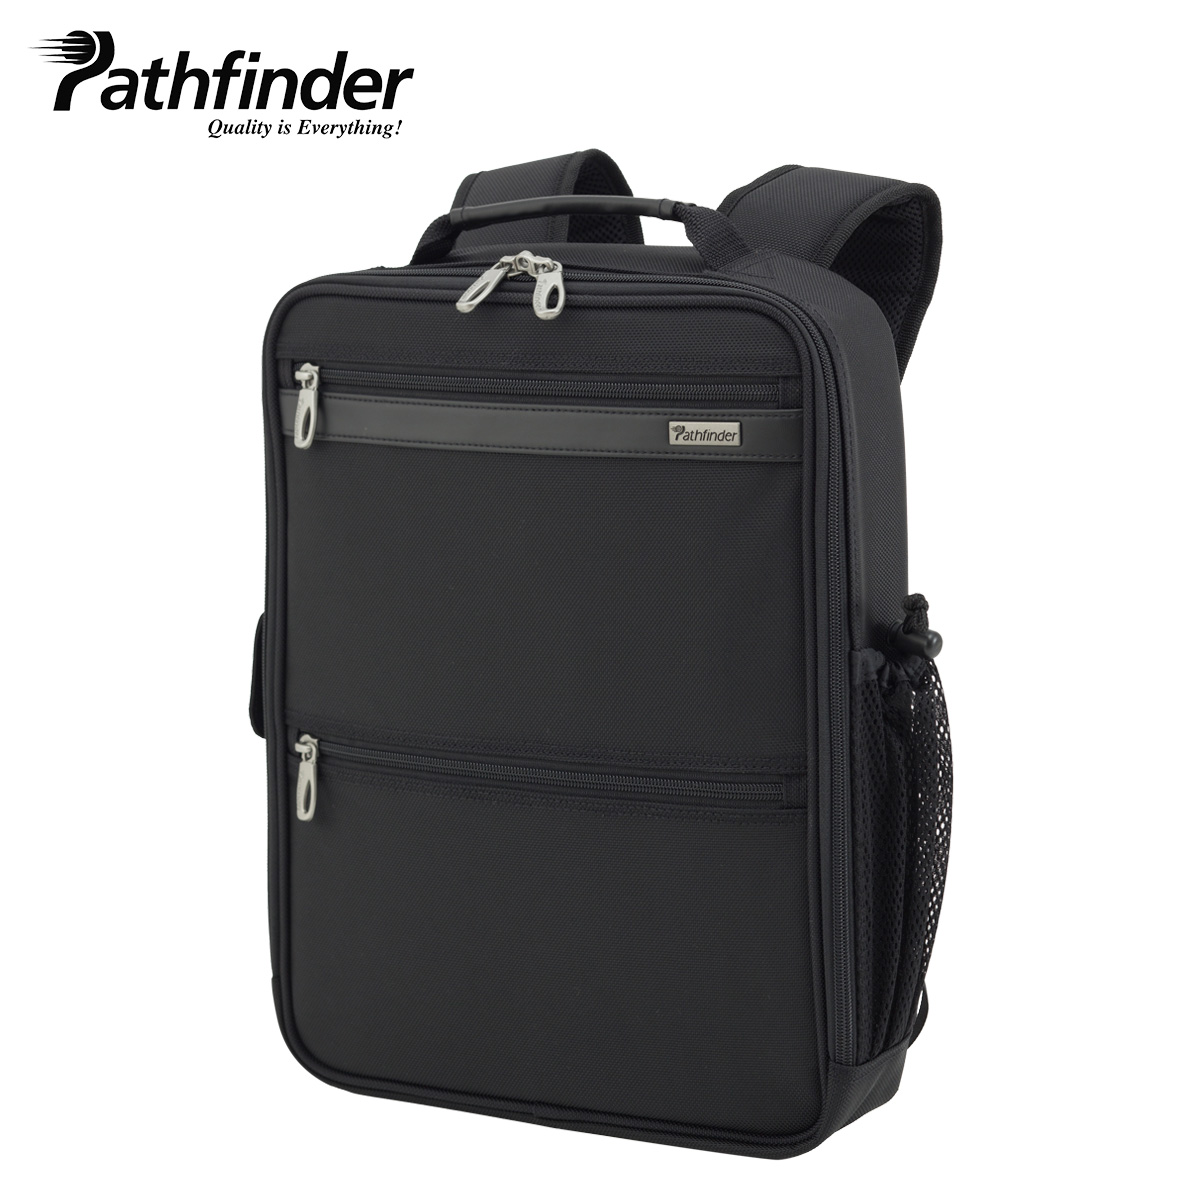 Pathfinder AVENGER パスファインダー バッグ ビジネスバッグ リュック バックパック メンズ ブラック 黒 PF1841B